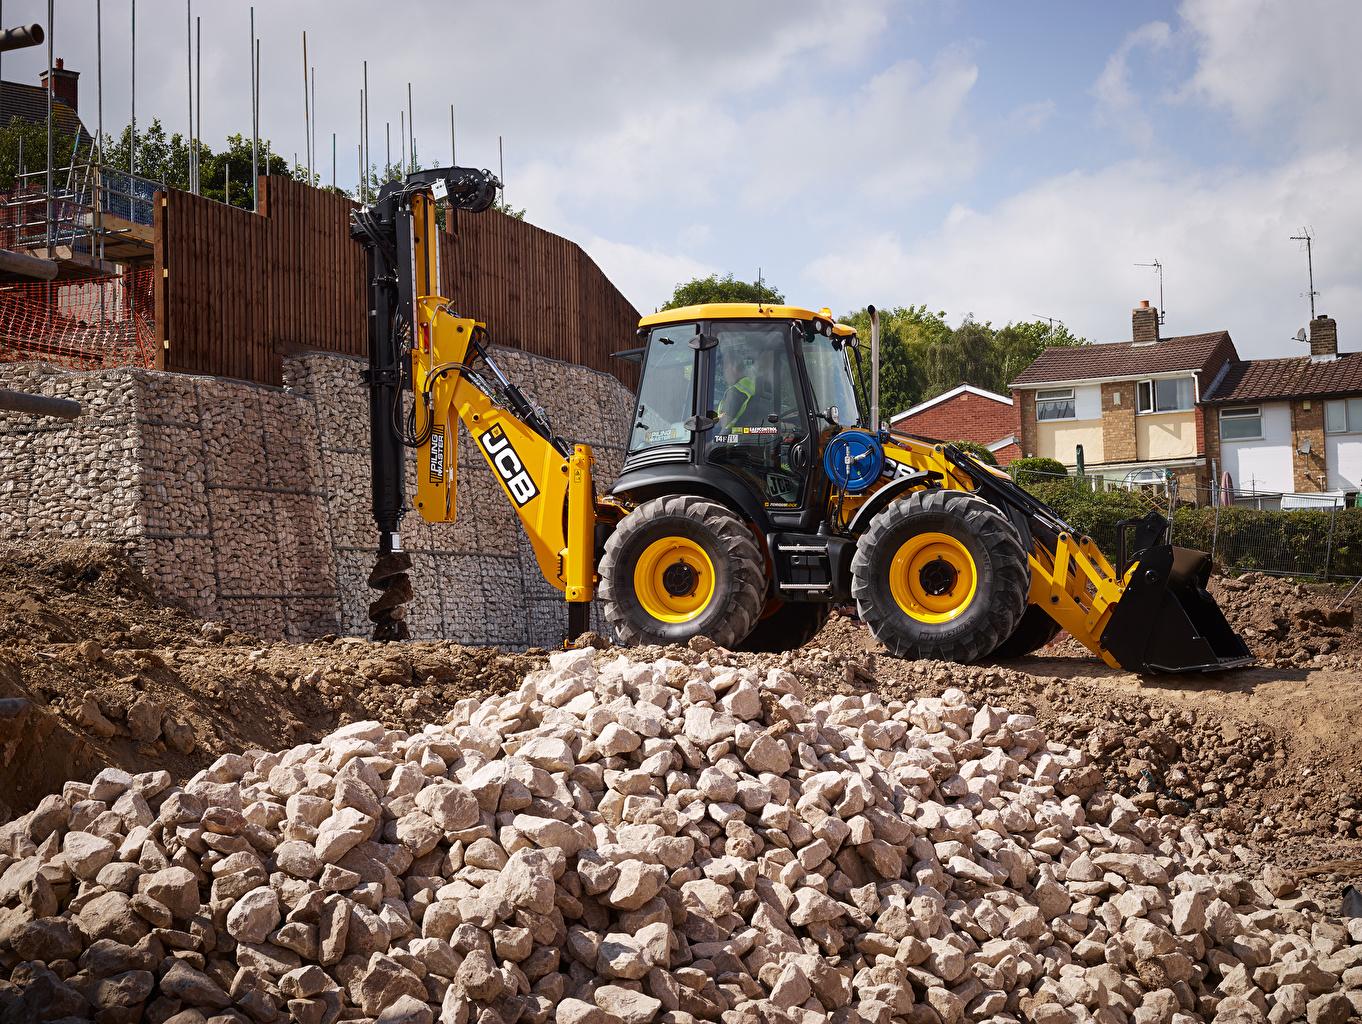 Photos tractors 2015-17 JCB 4CX PilingMaster Side Stones Tractor stone